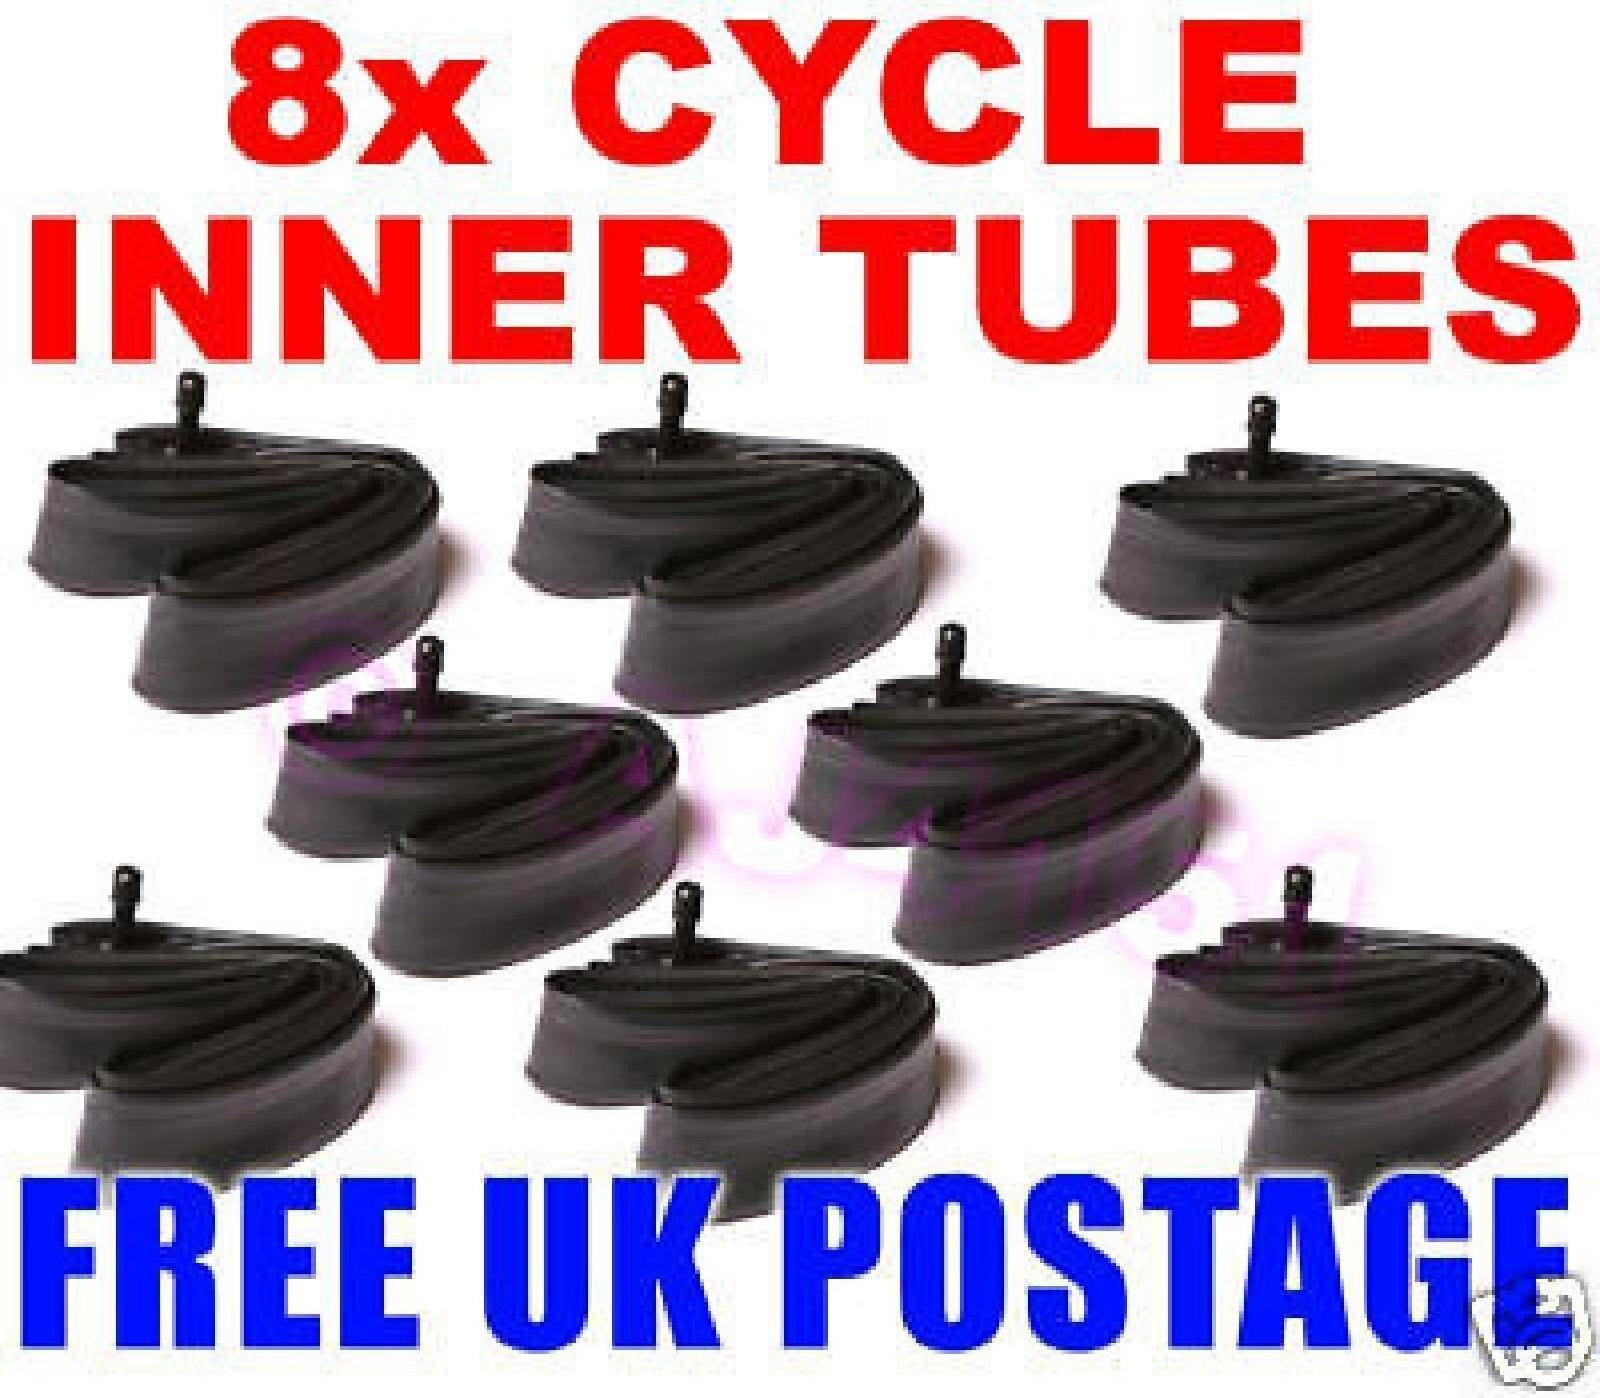 700 x 28-32c SCHRADER Mountain Bike Cycle Inner Tubes x10 700c 28c 32c Butyl